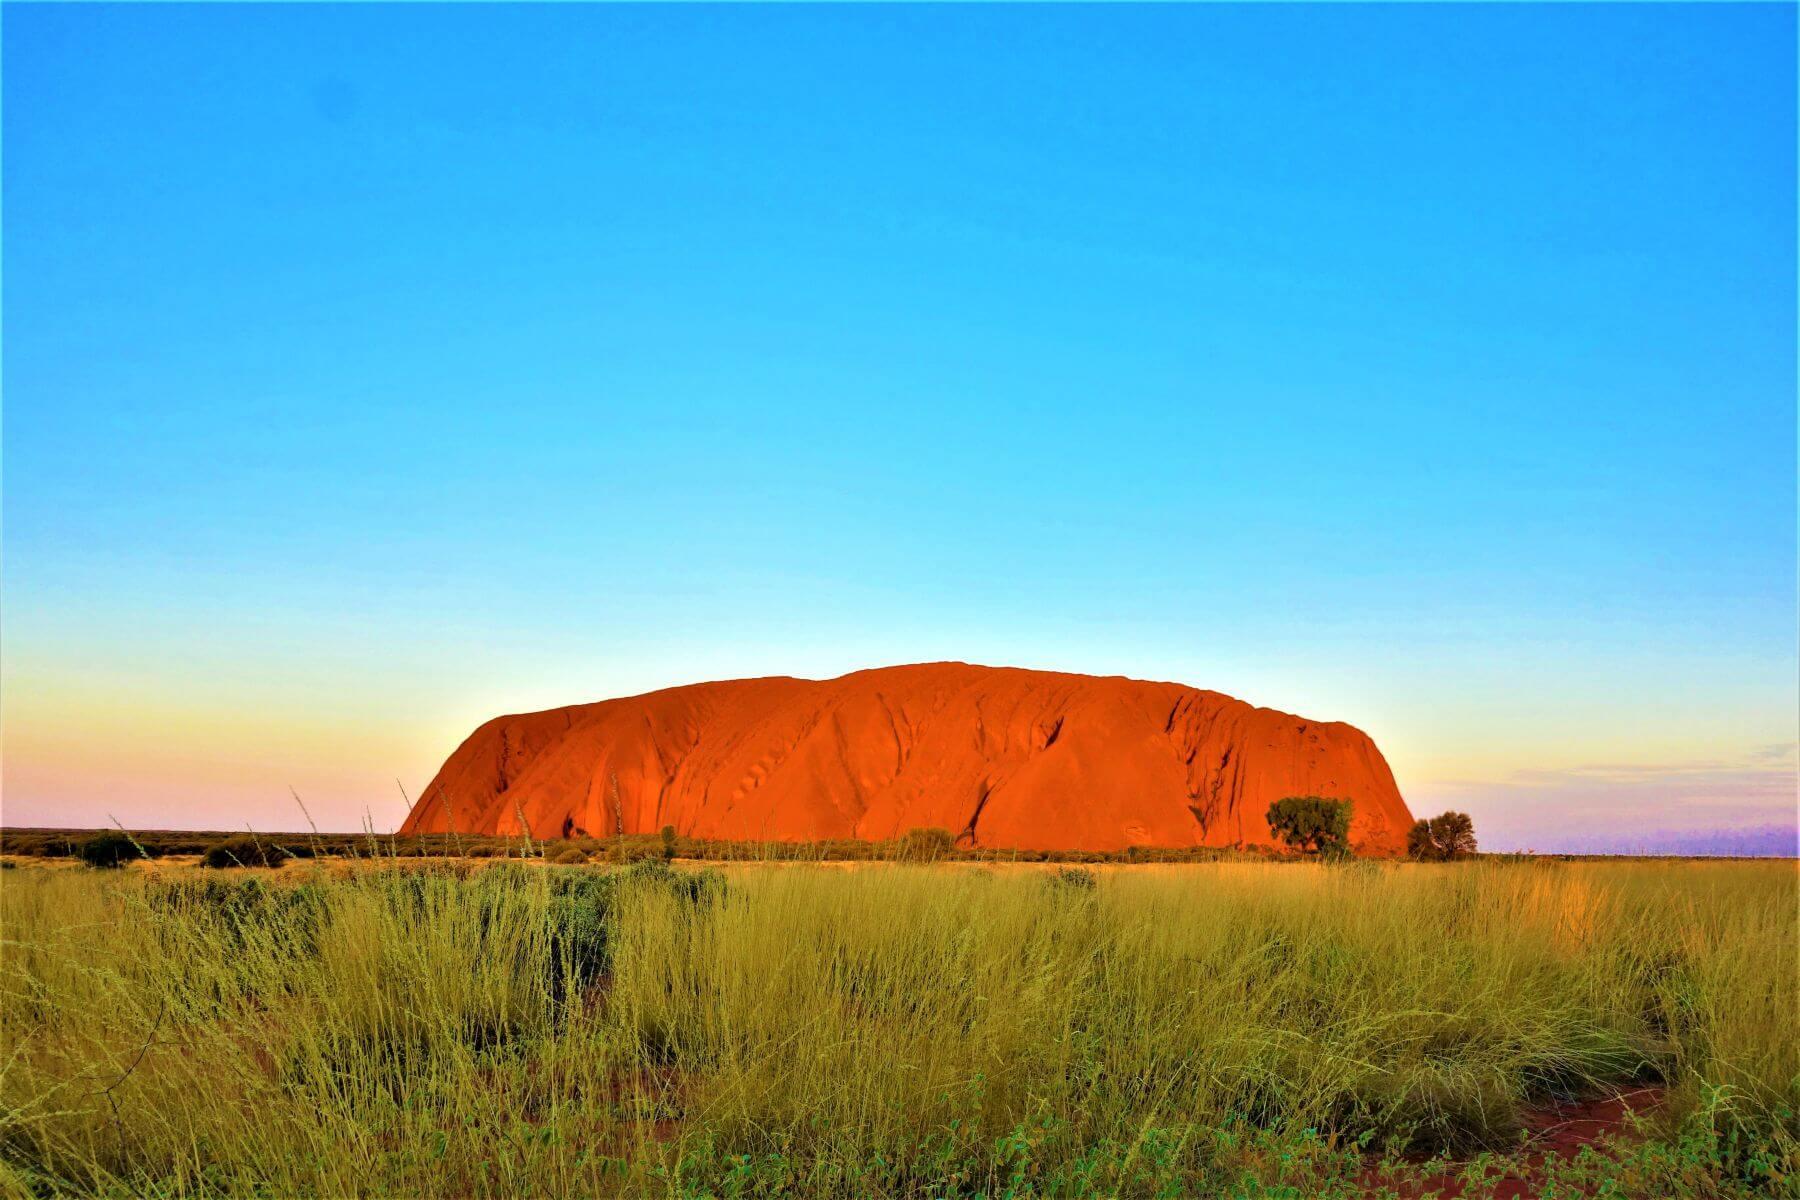 Roter Berg Ayers Rock - Uluru beim Sonnenuntergang in Australien